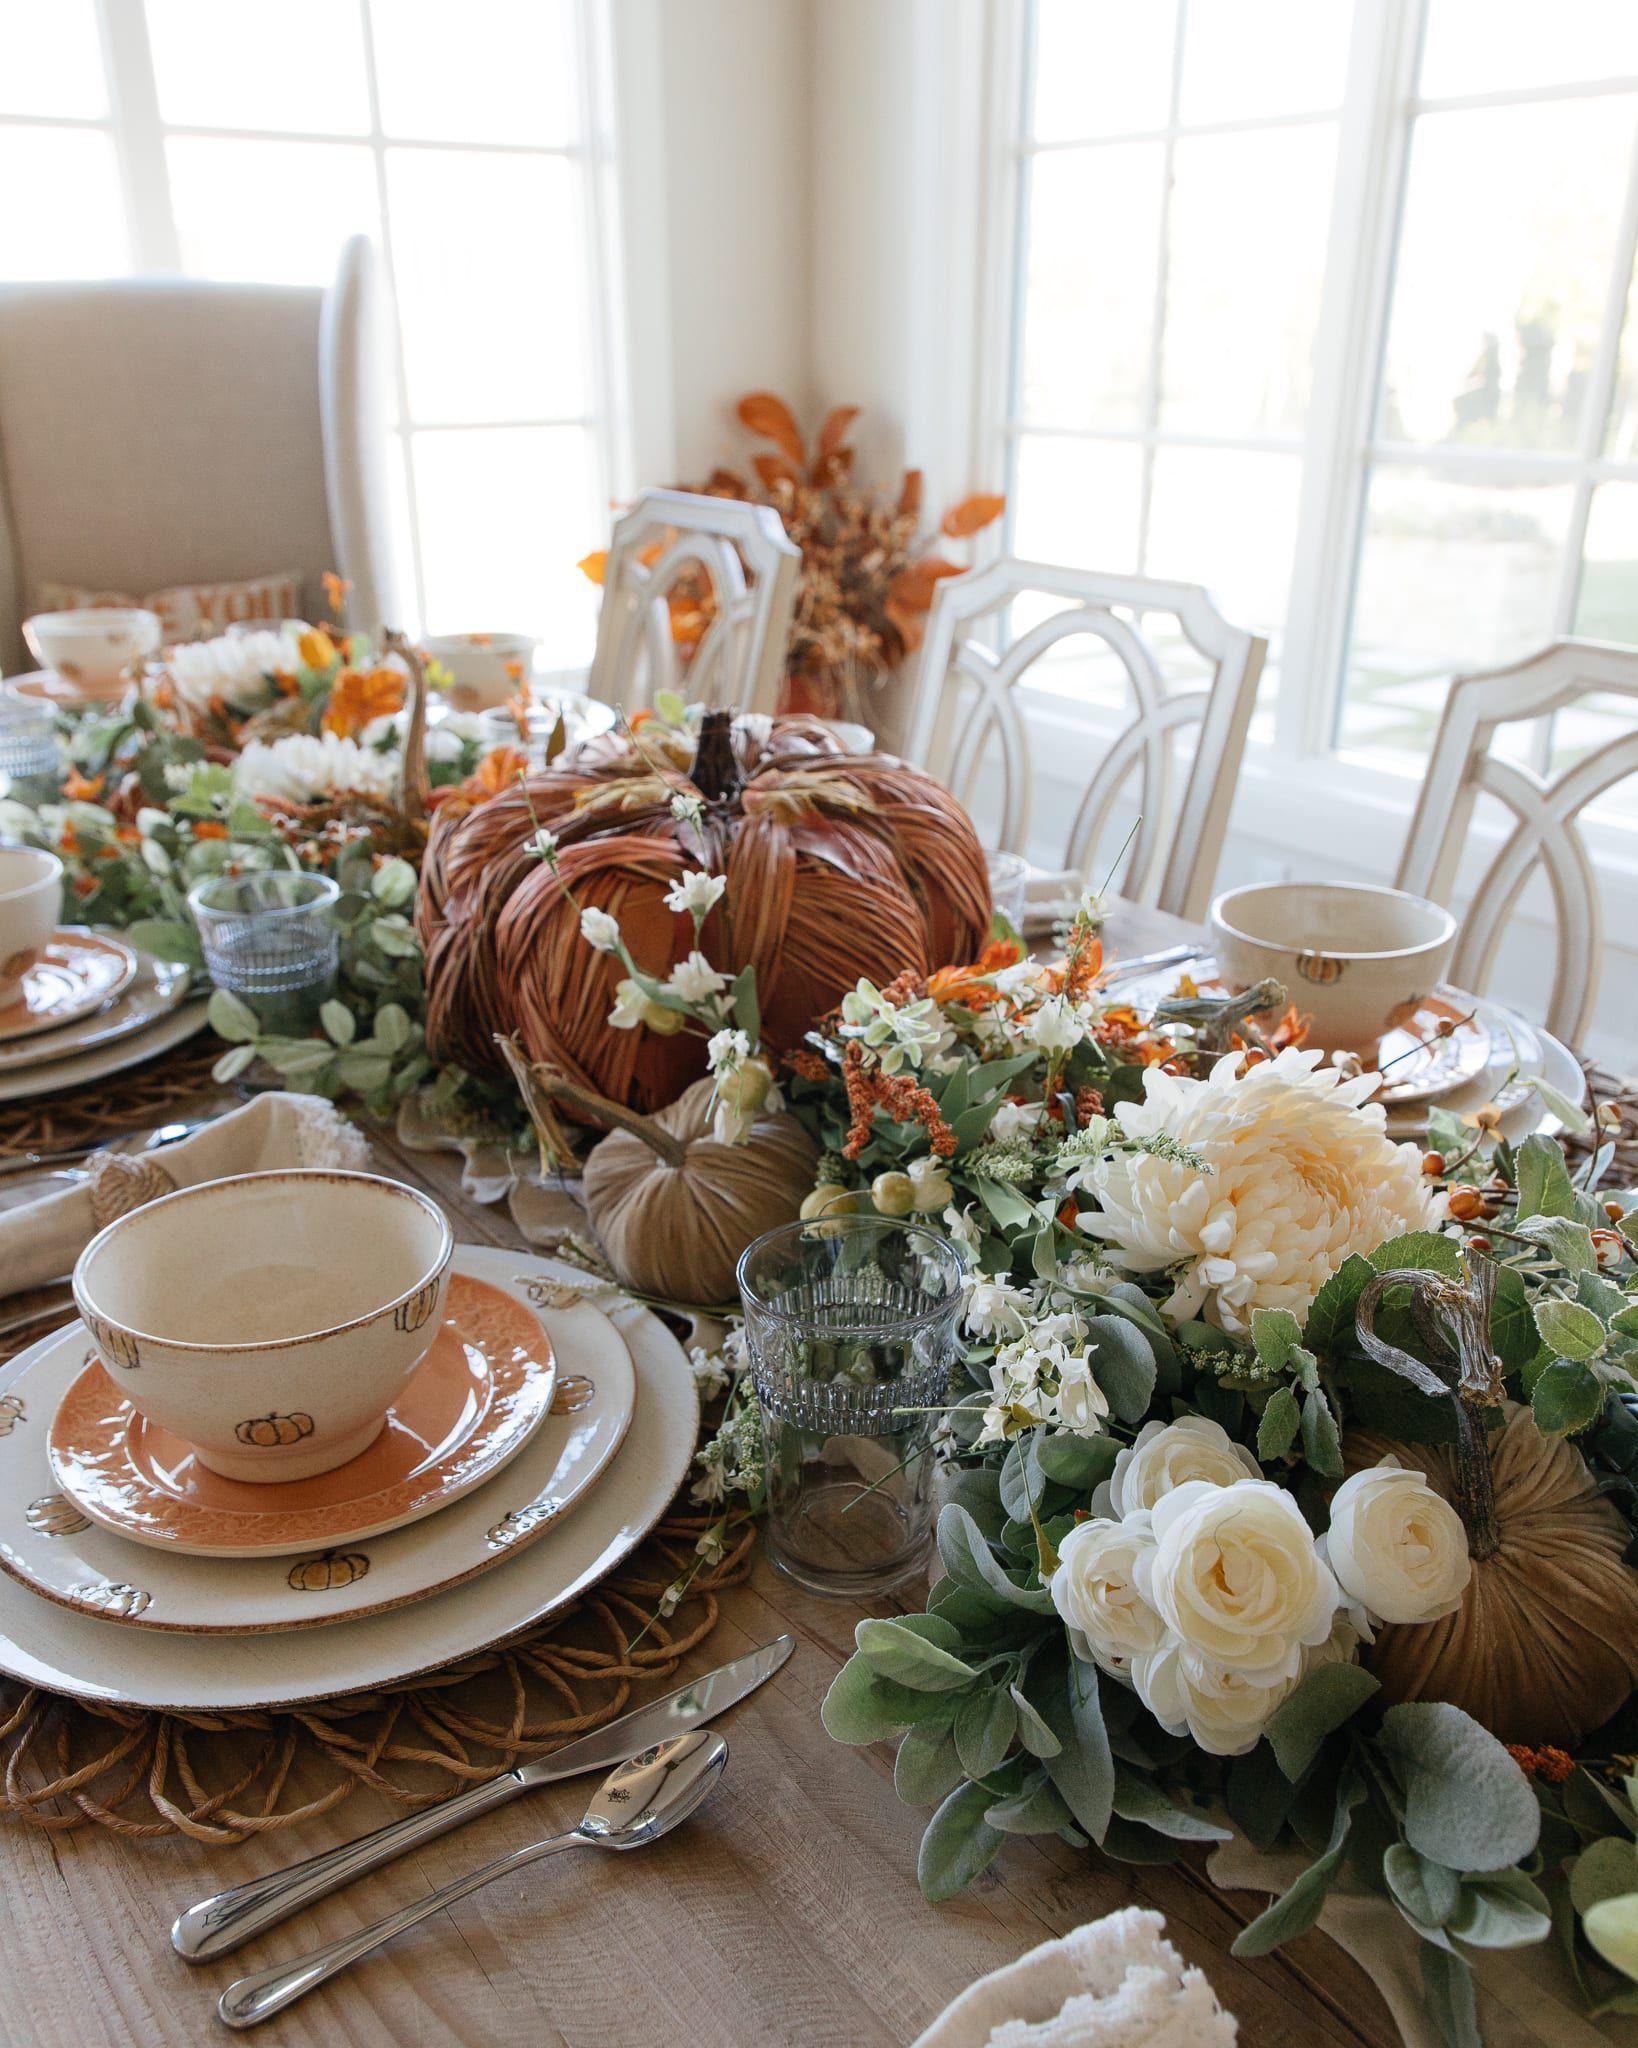 Halloween Spider Web Fruit Dish Candy Bowl Serving Dish Tapletop Home Decor DIY